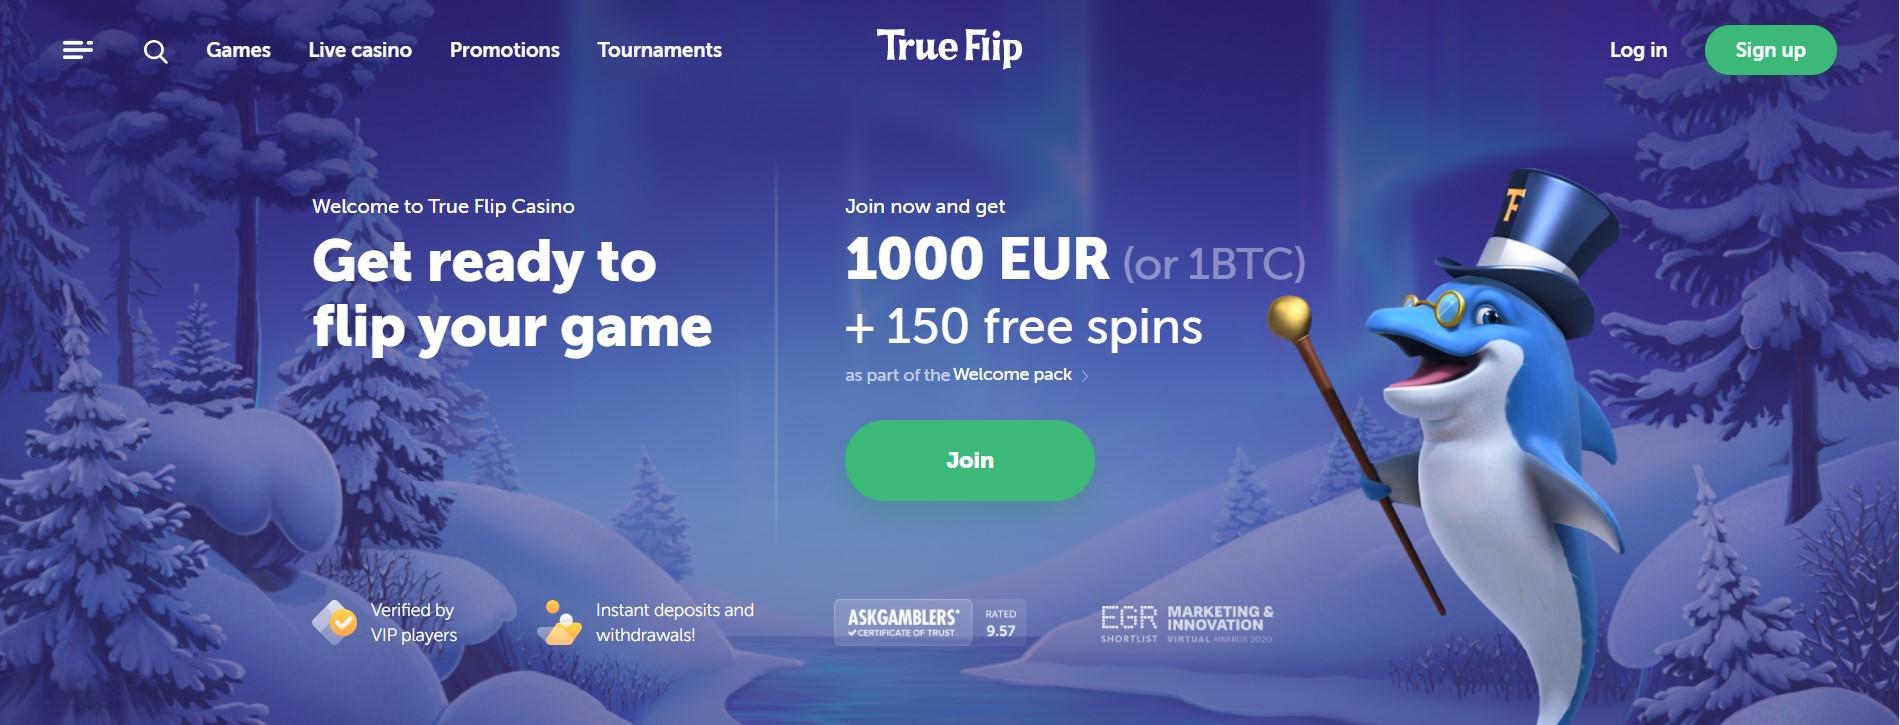 trueflip welcome bonus screenshot